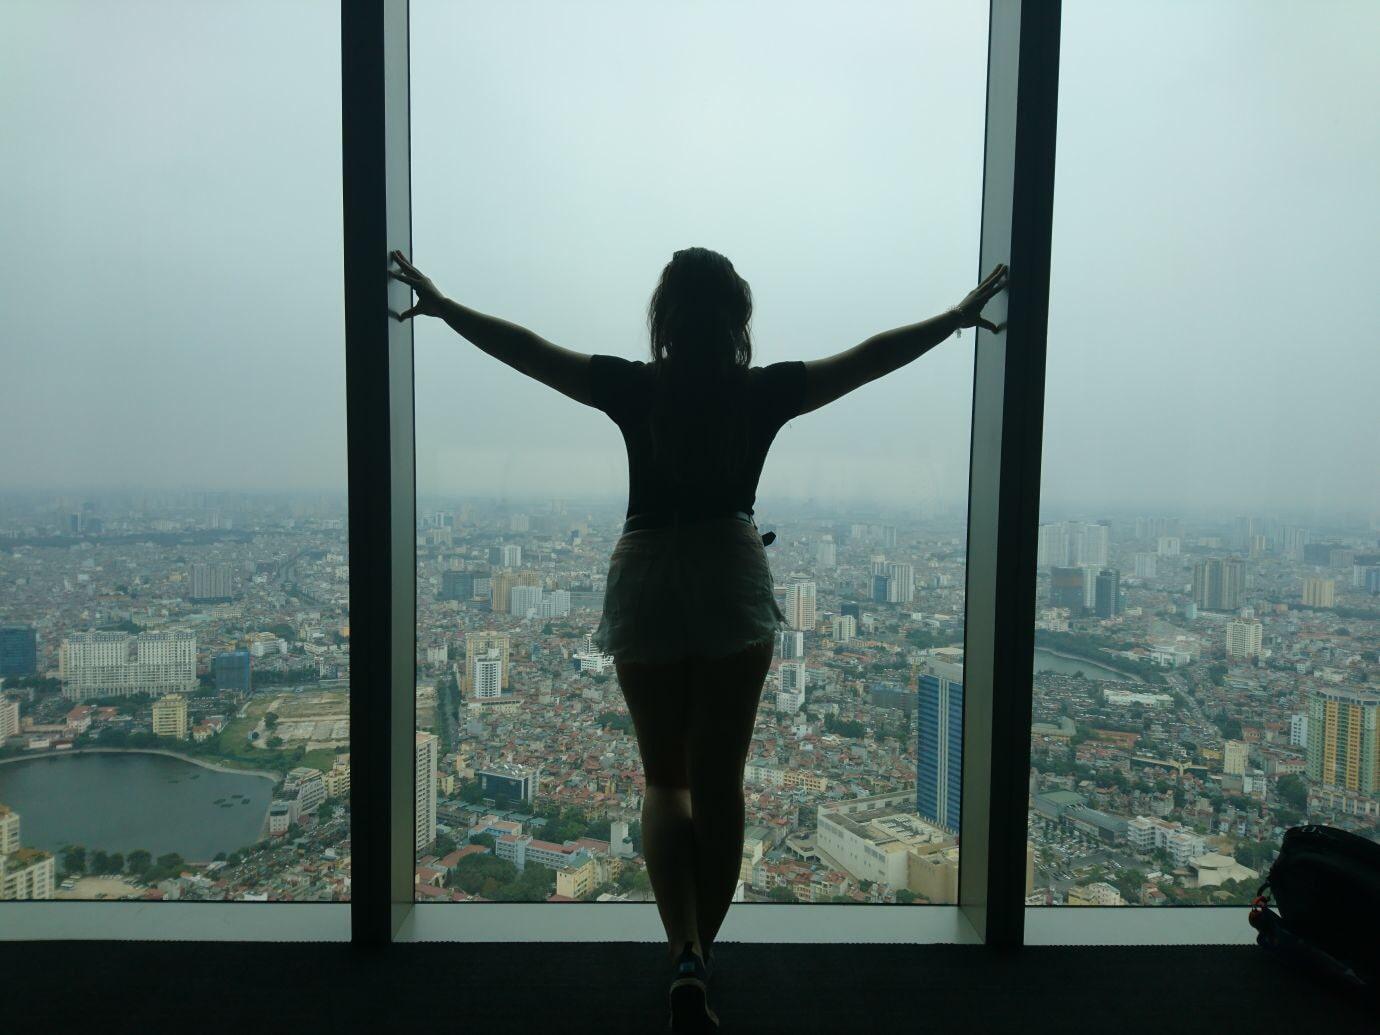 Lotte Tower Observation Deck in Hanoi Vietnam